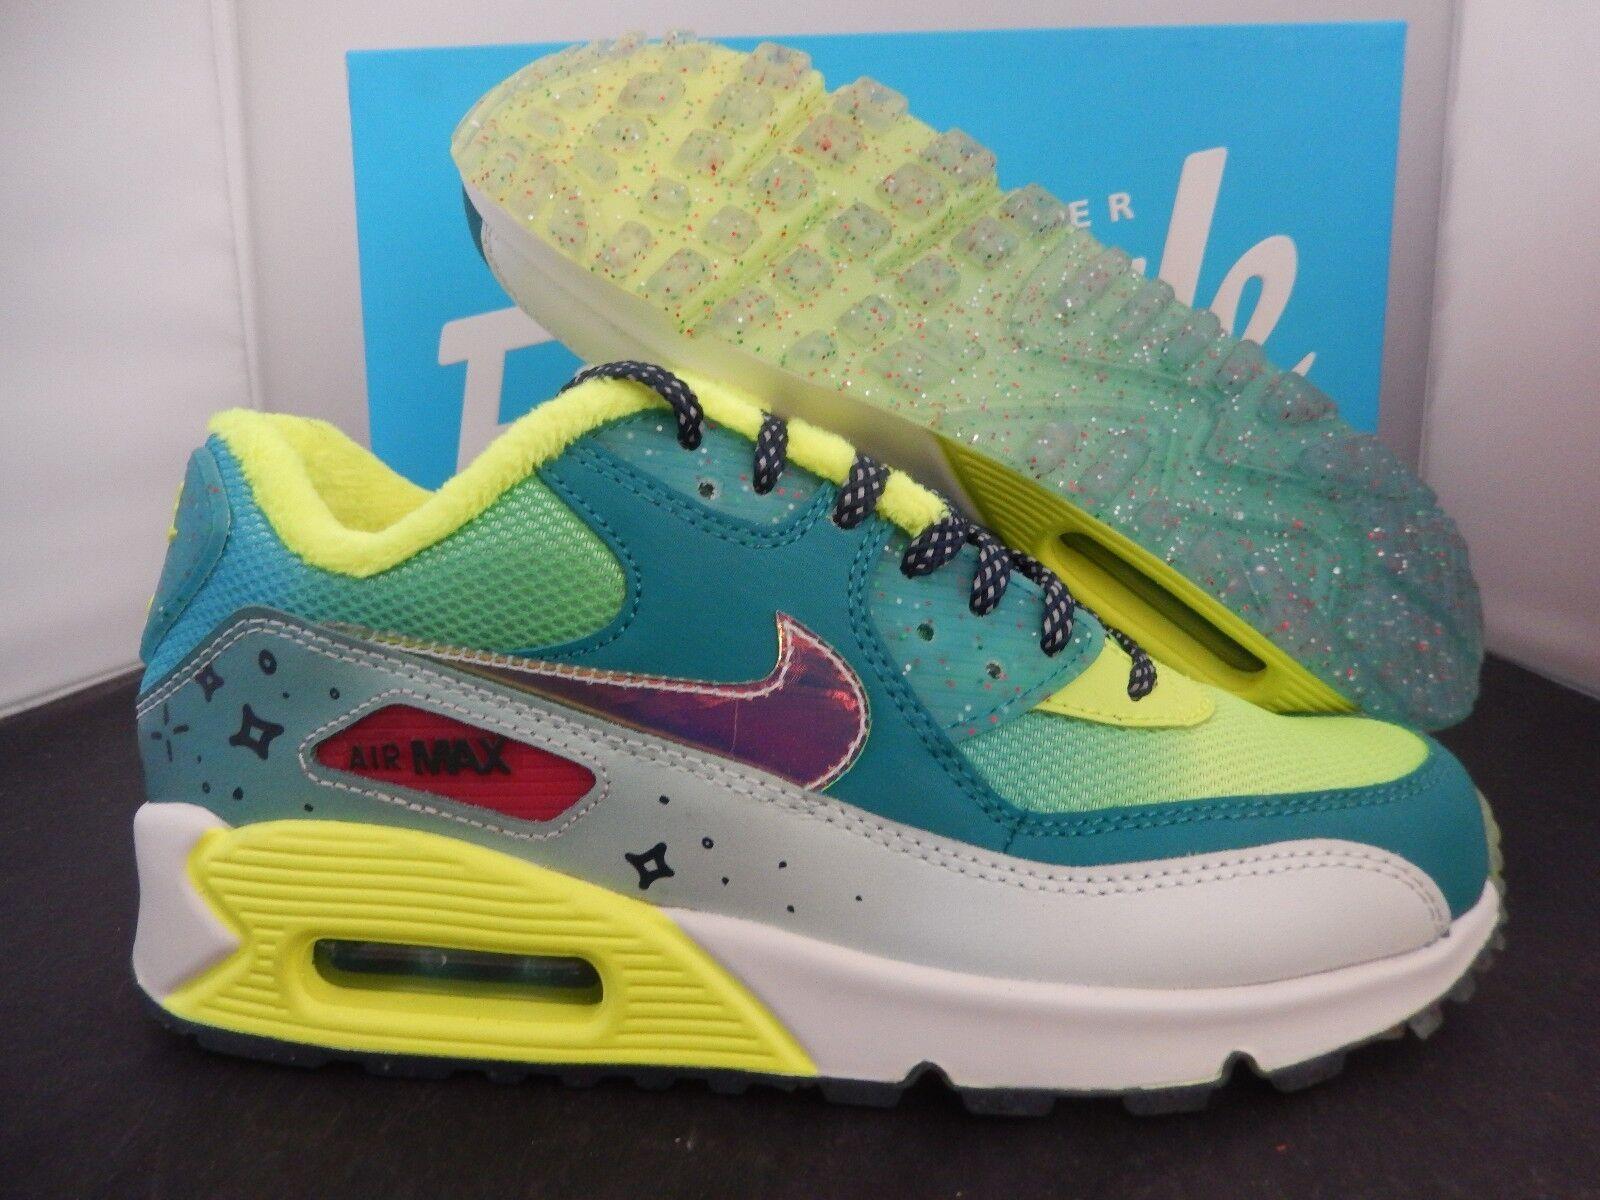 Nike Air Max 90 Women Yellow Black Sneakers Shoes  Nike 374